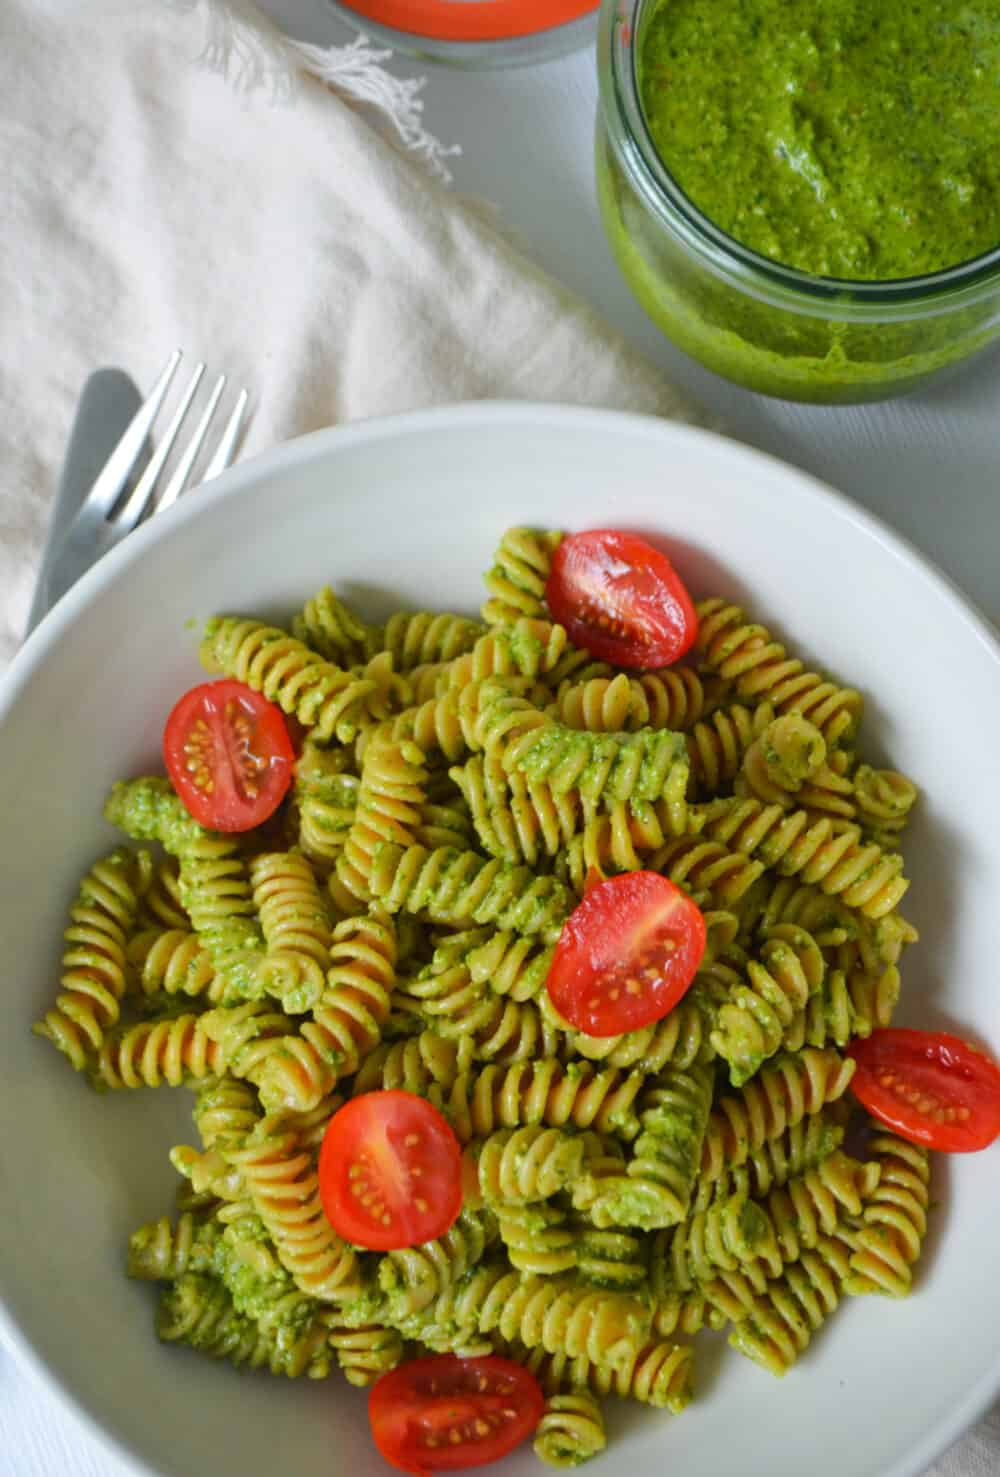 Spinach Pesto Sauce